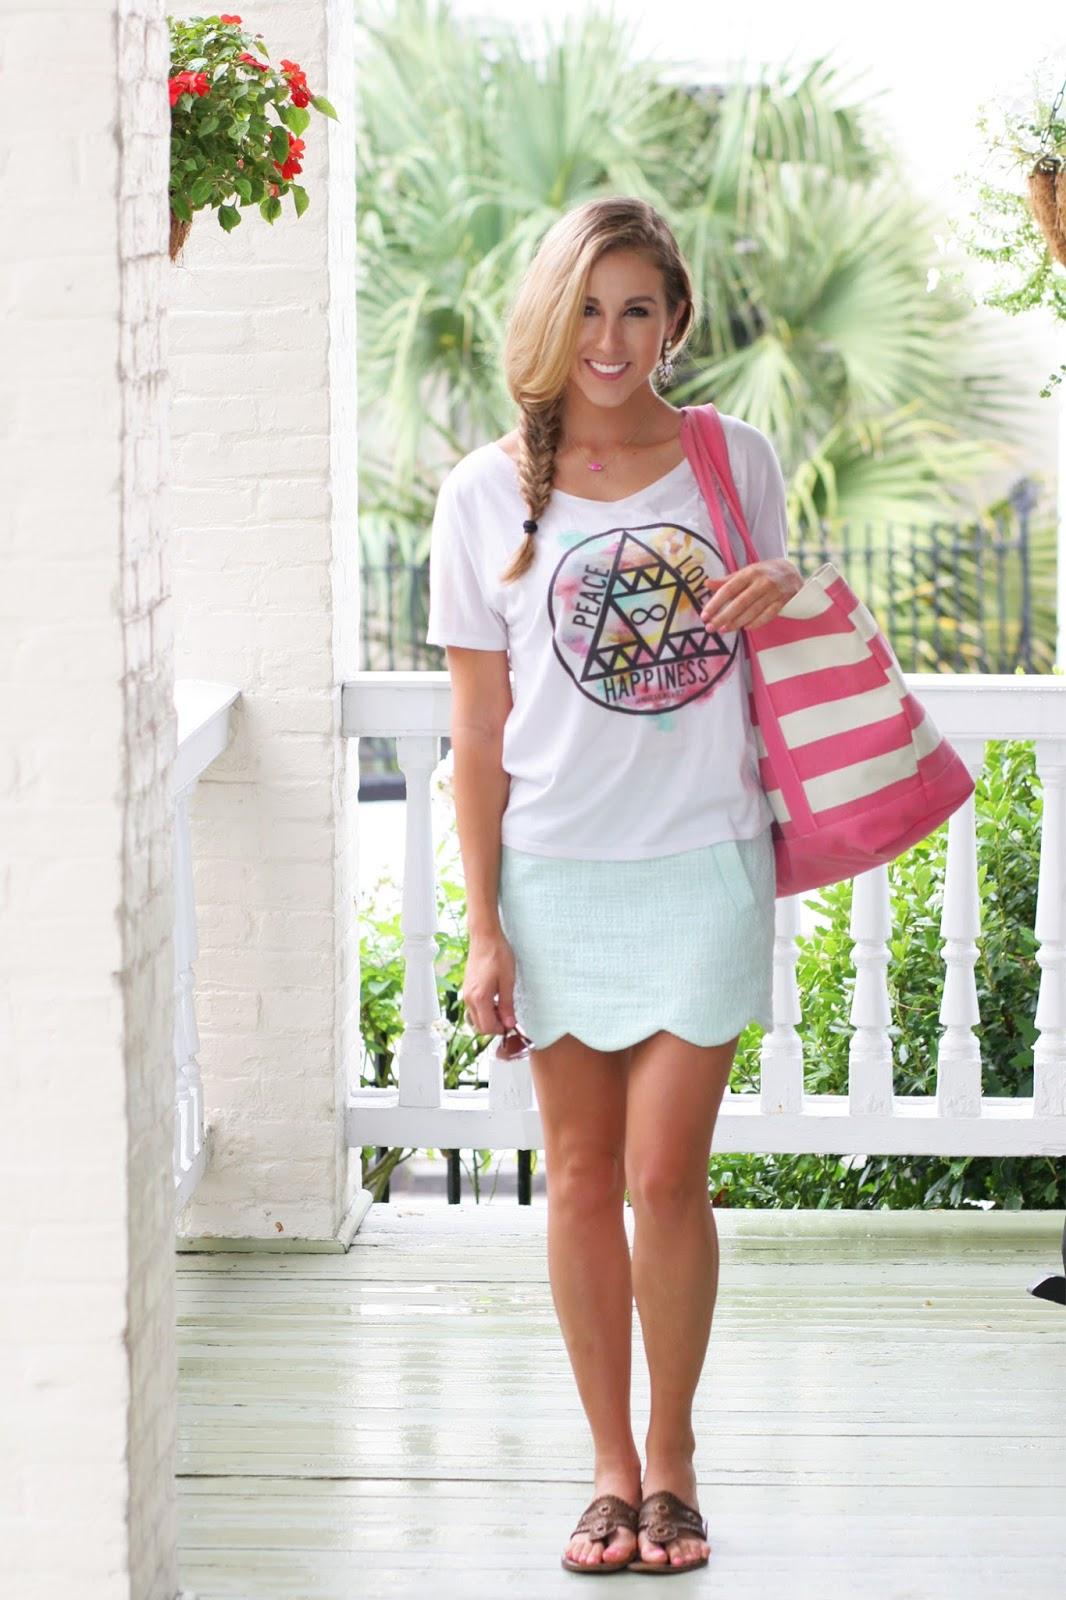 Scallop Skirt & Watercolors